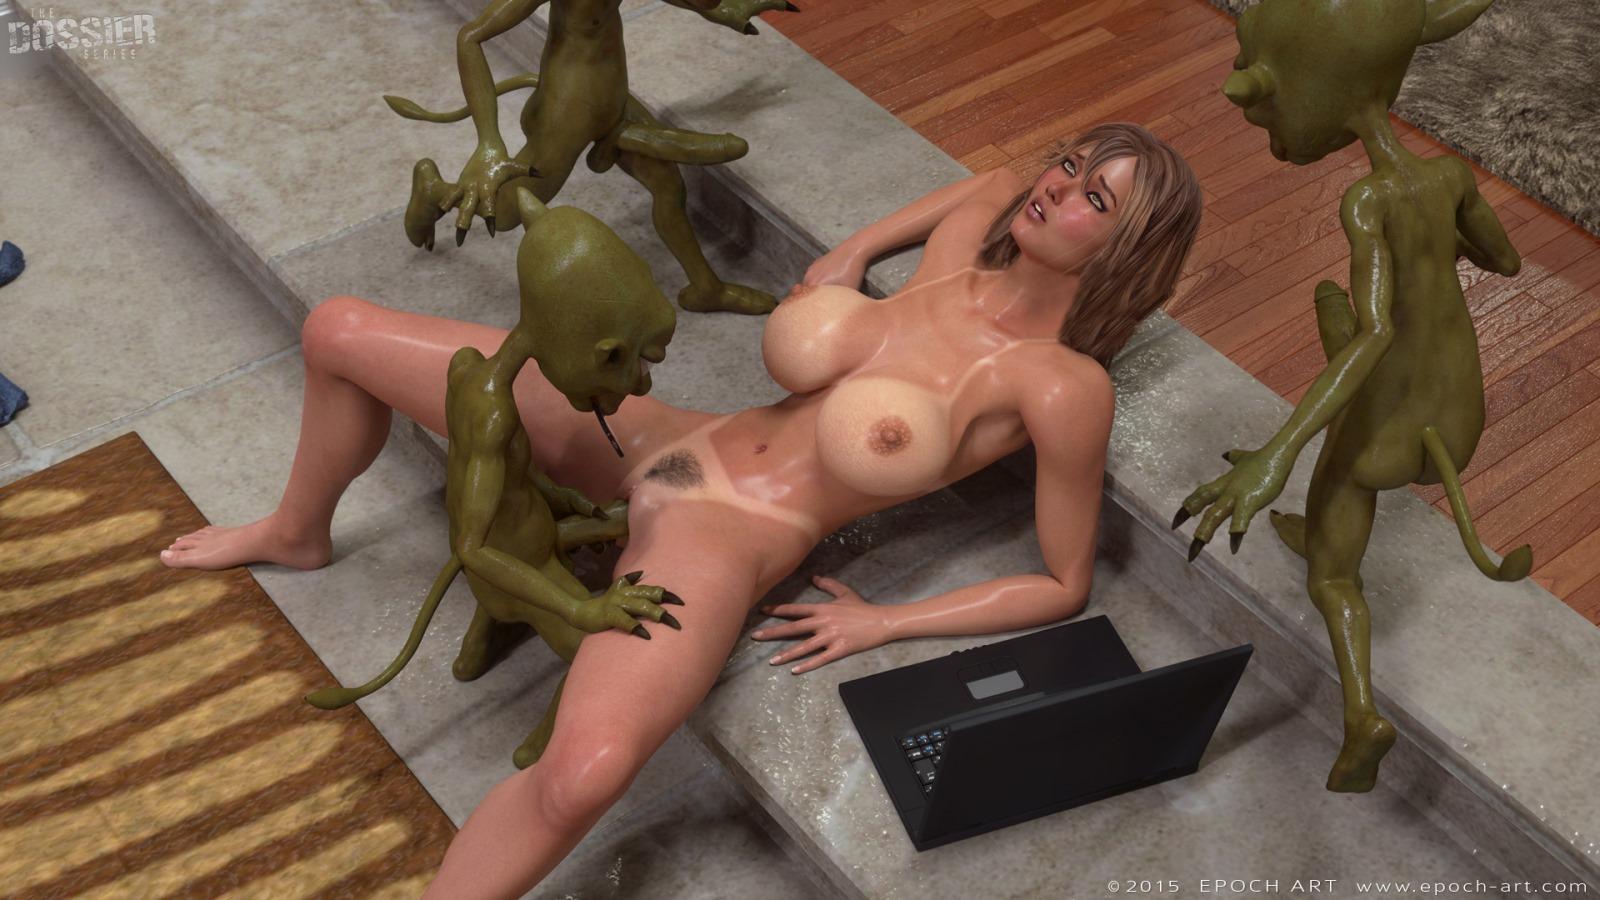 First Porn Scene